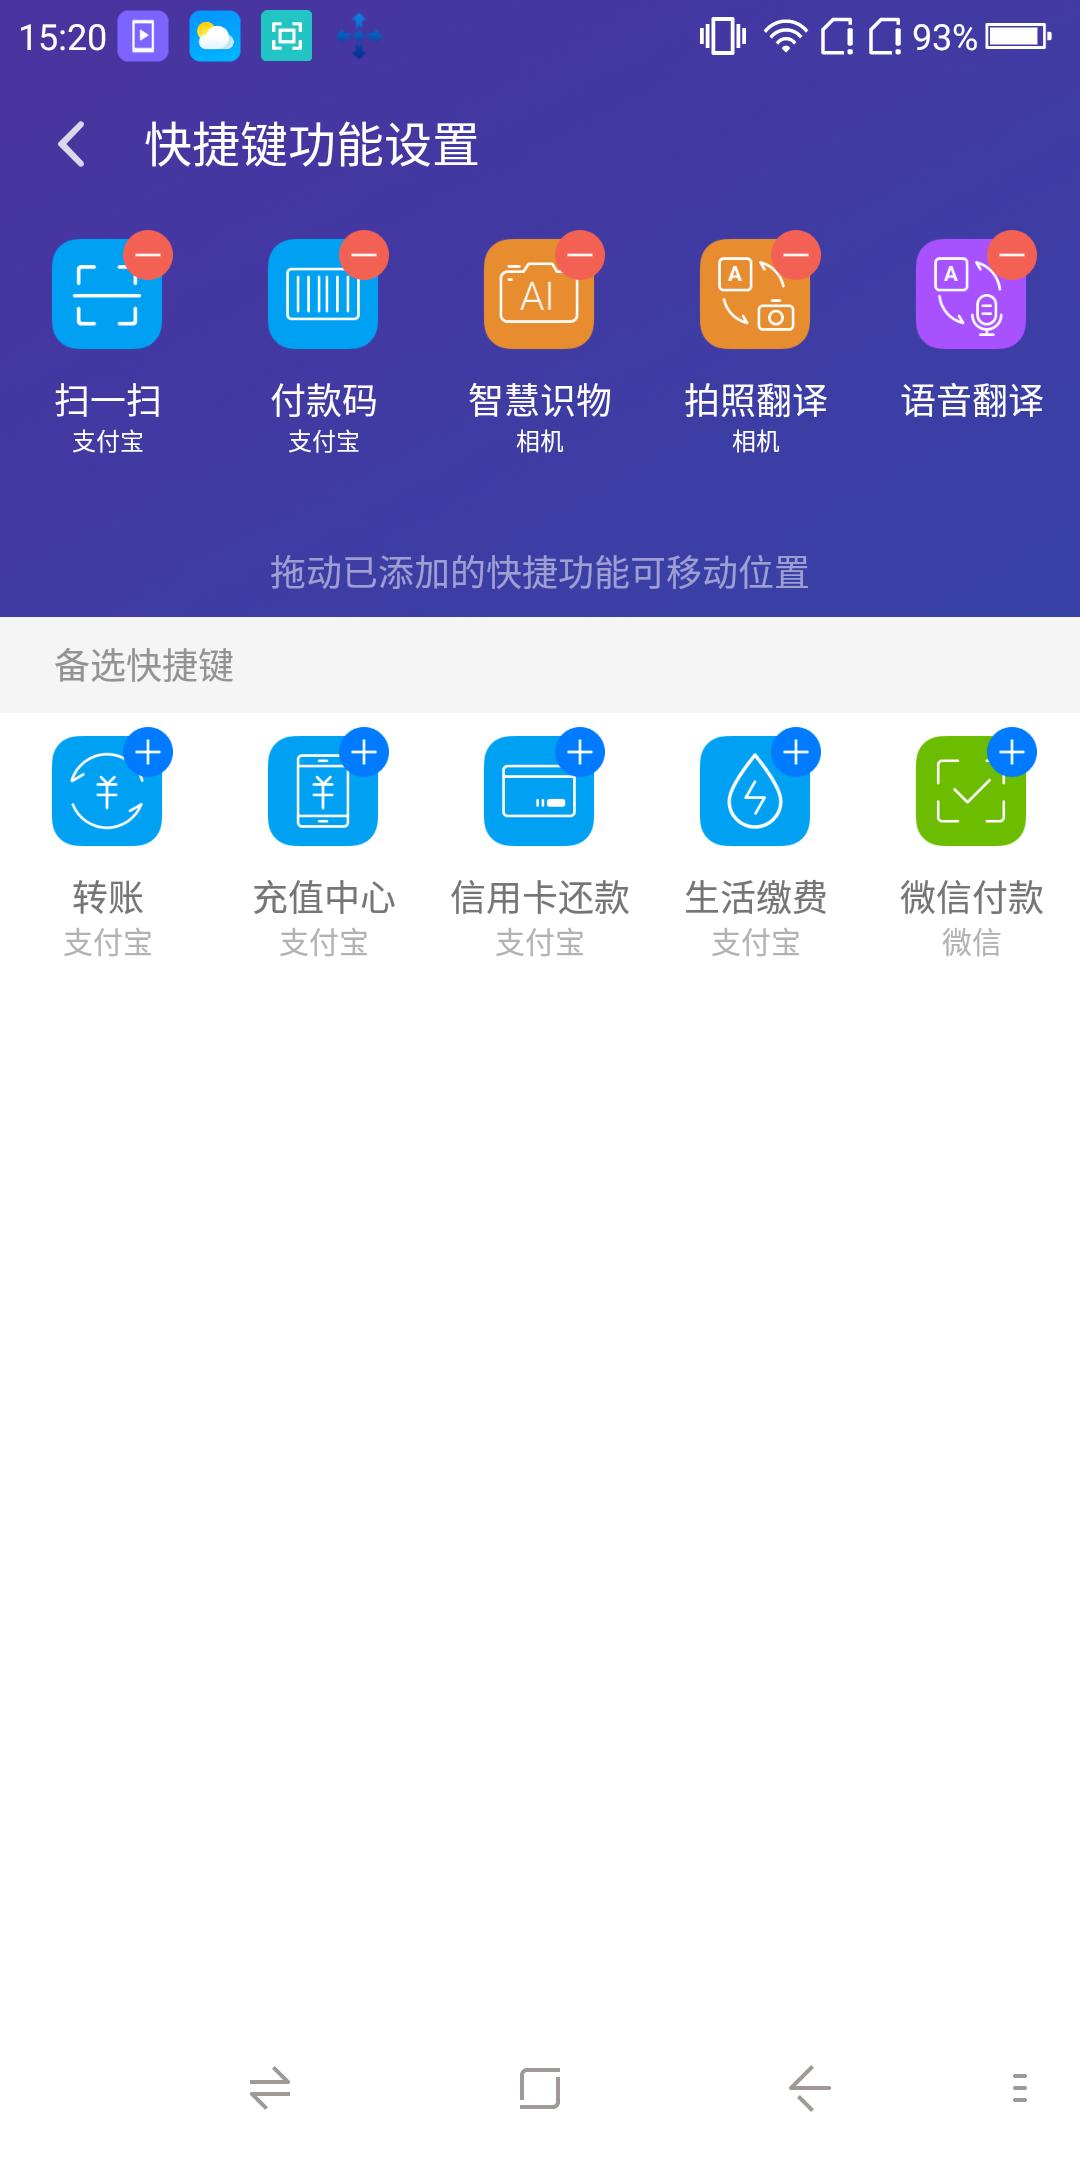 Screenshot_2018-08-22-15-20-19.png